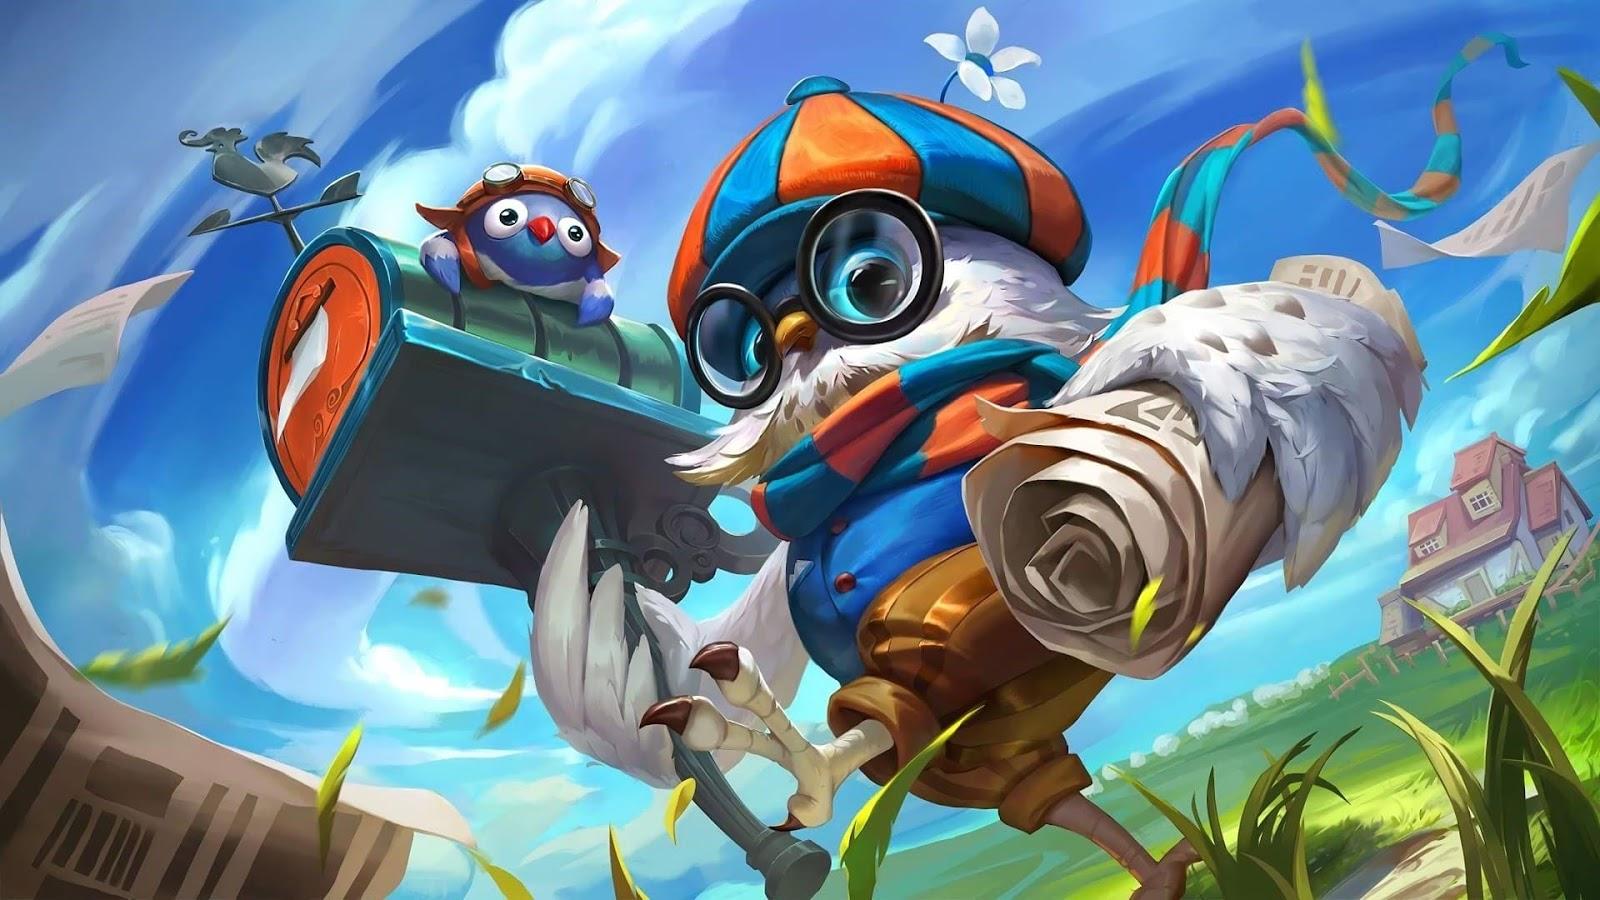 Wallpaper Diggie Pigeoneer Skin Mobile Legends HD for PC